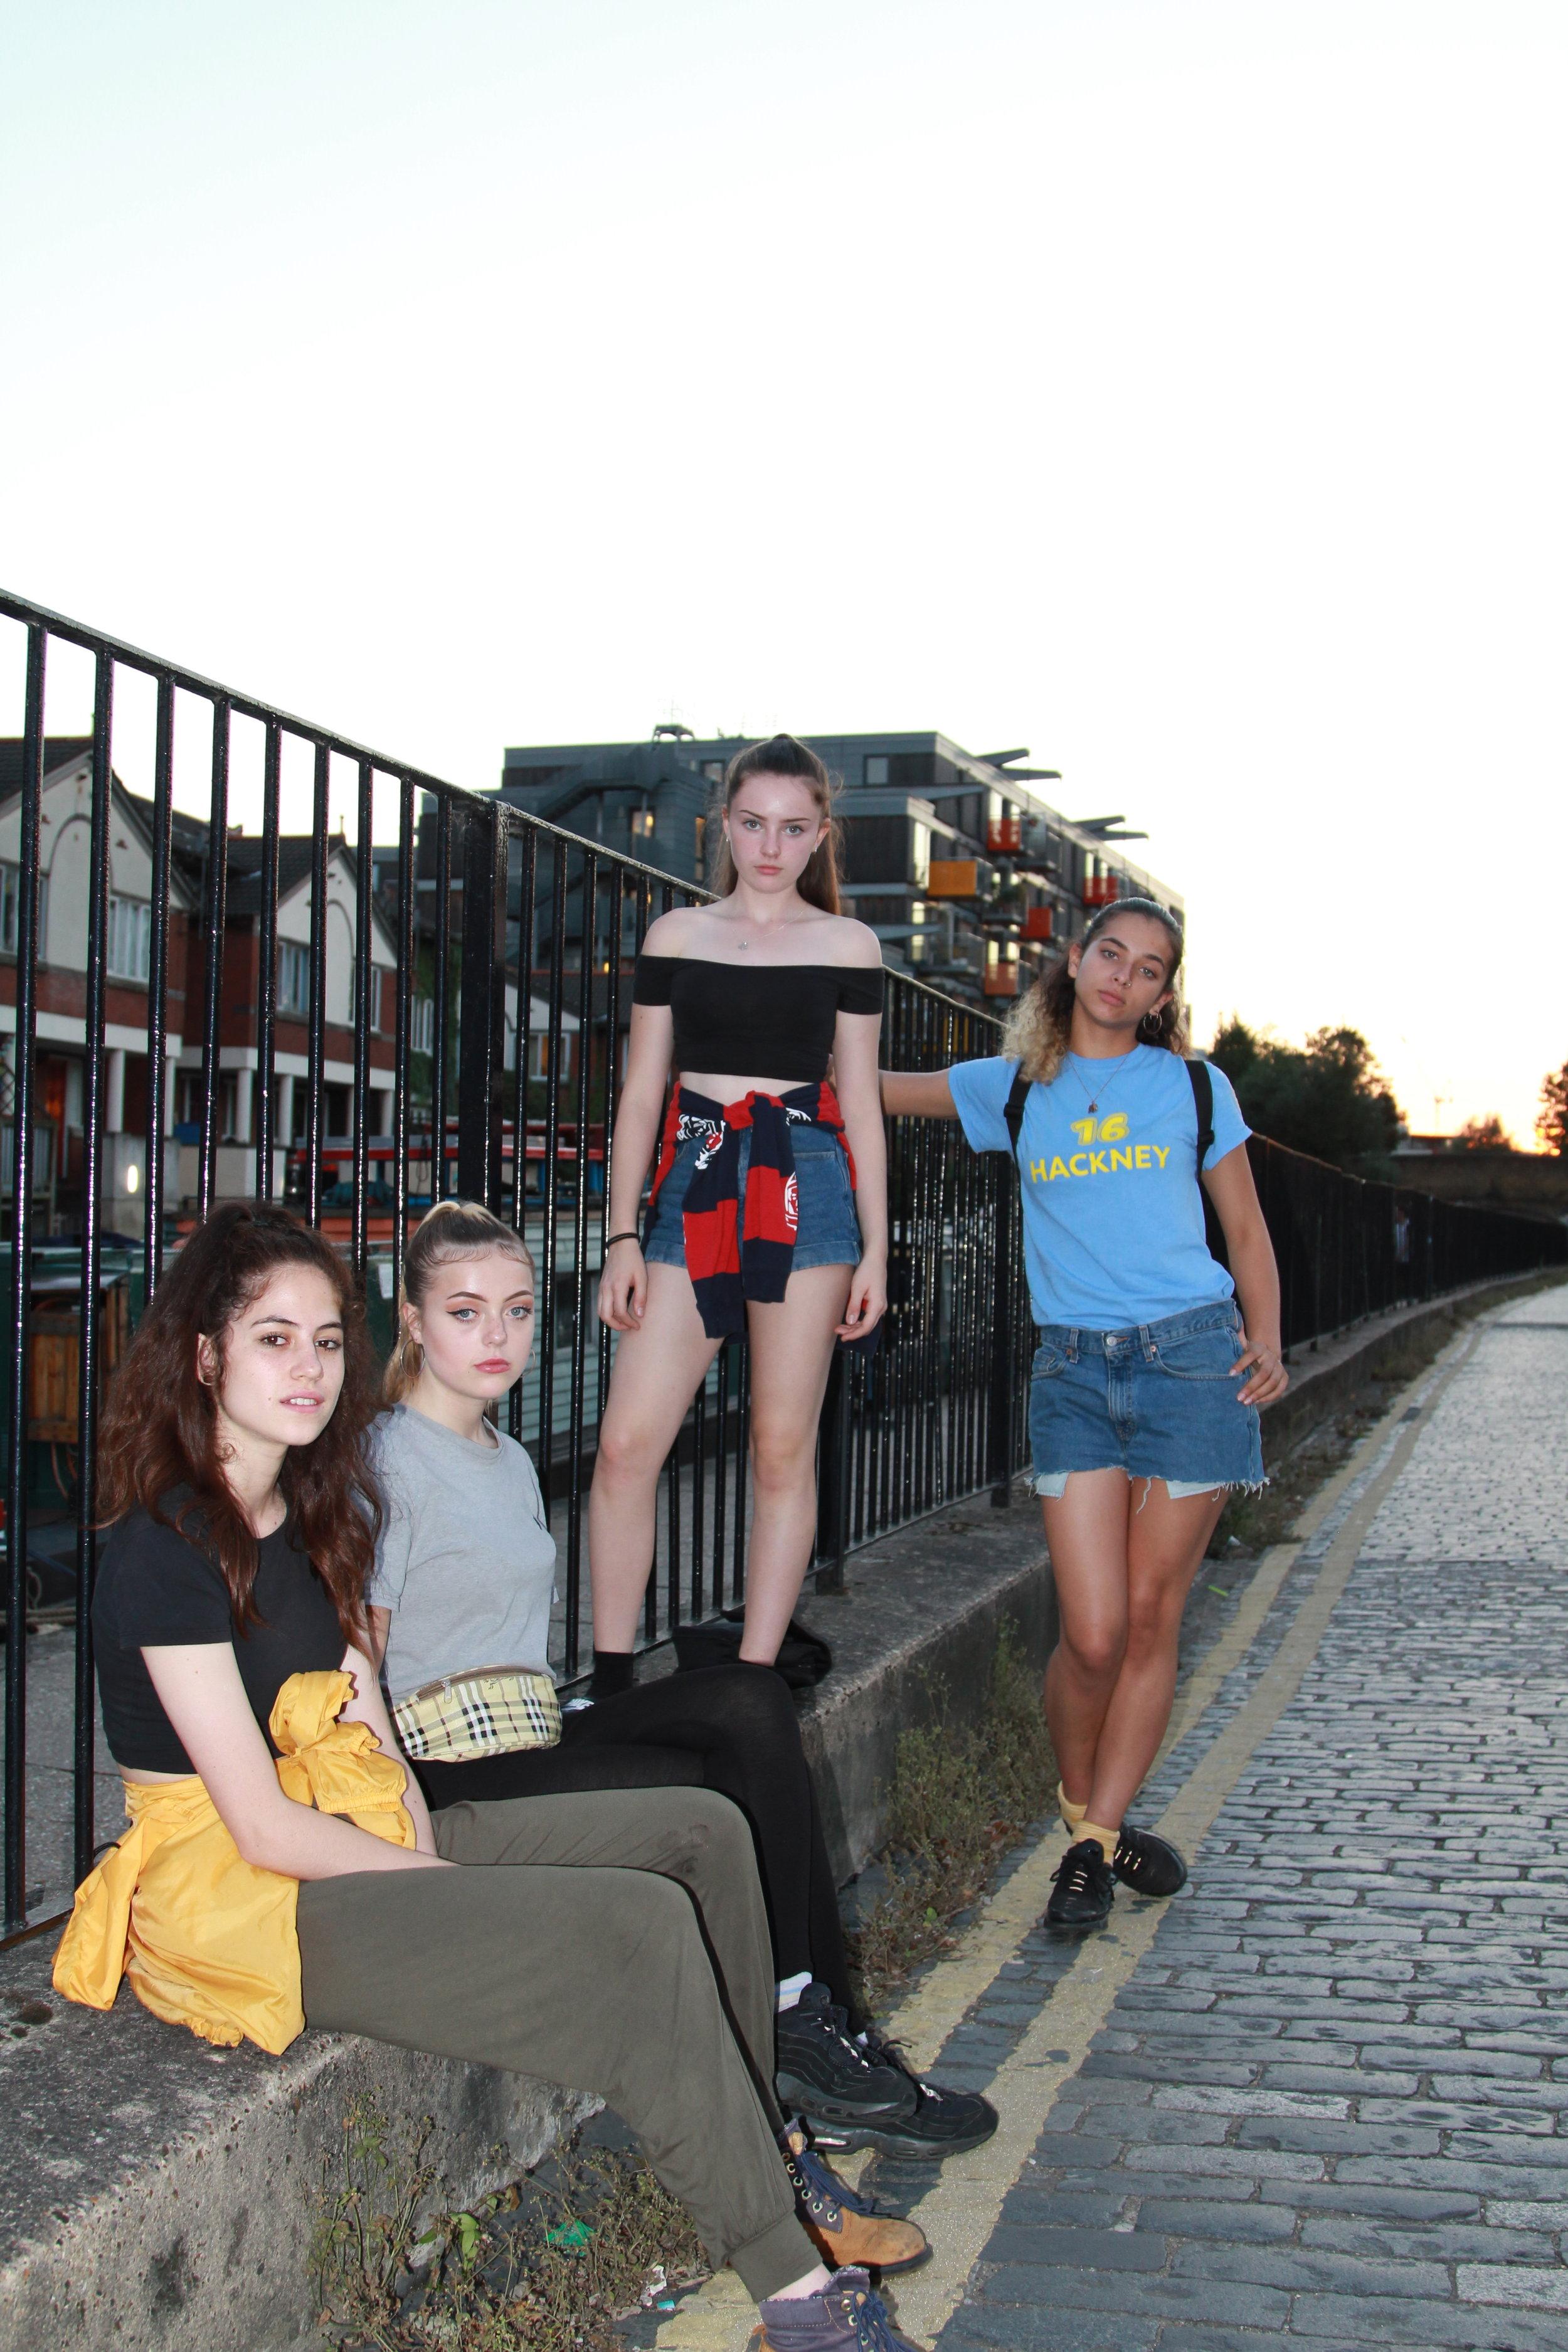 Gal Dem, Regents Canal - London. September 2016